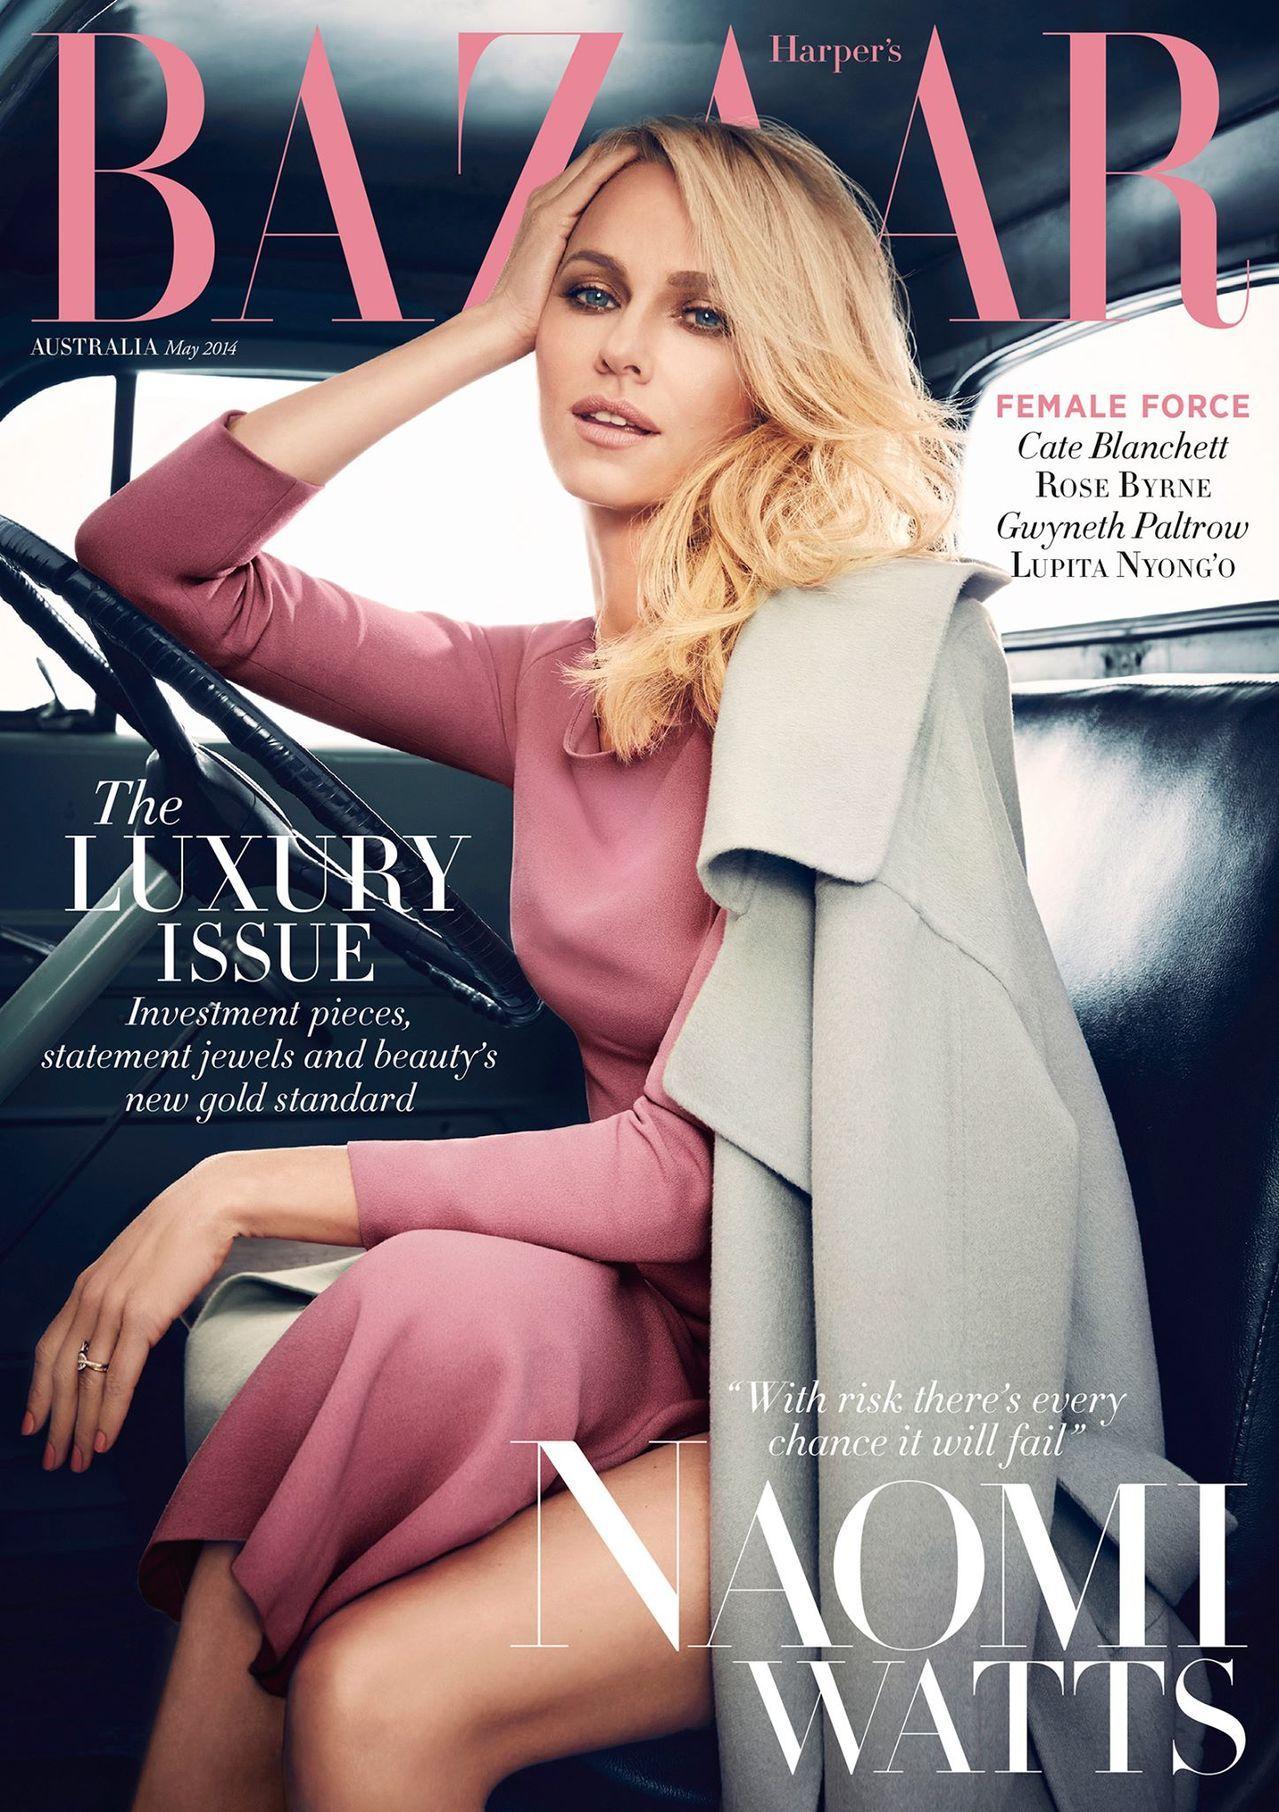 Naomi Watts For Harper's Bazaar Magazine, Australia, May 2014